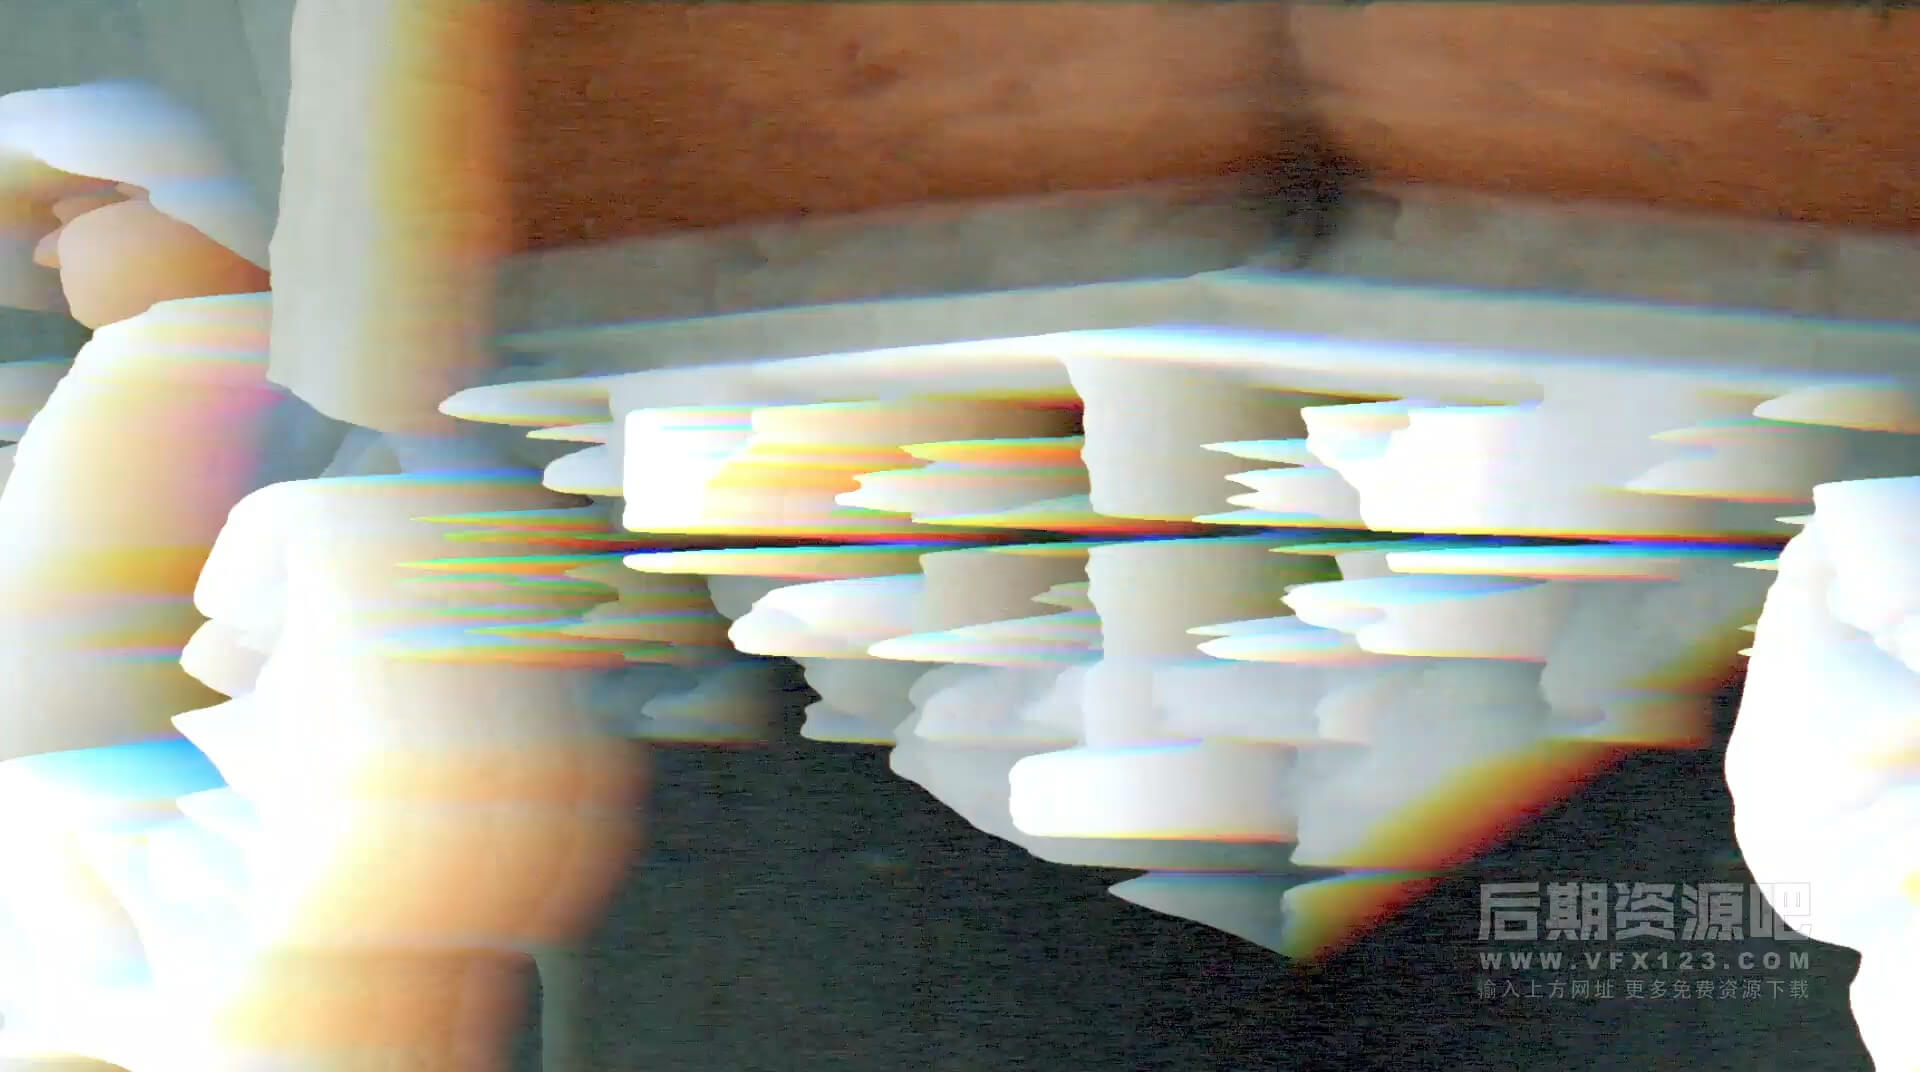 FCPX插件 50种毛刺失真色散变焦缩放过渡转场预设 FCPX Zoom Transitions